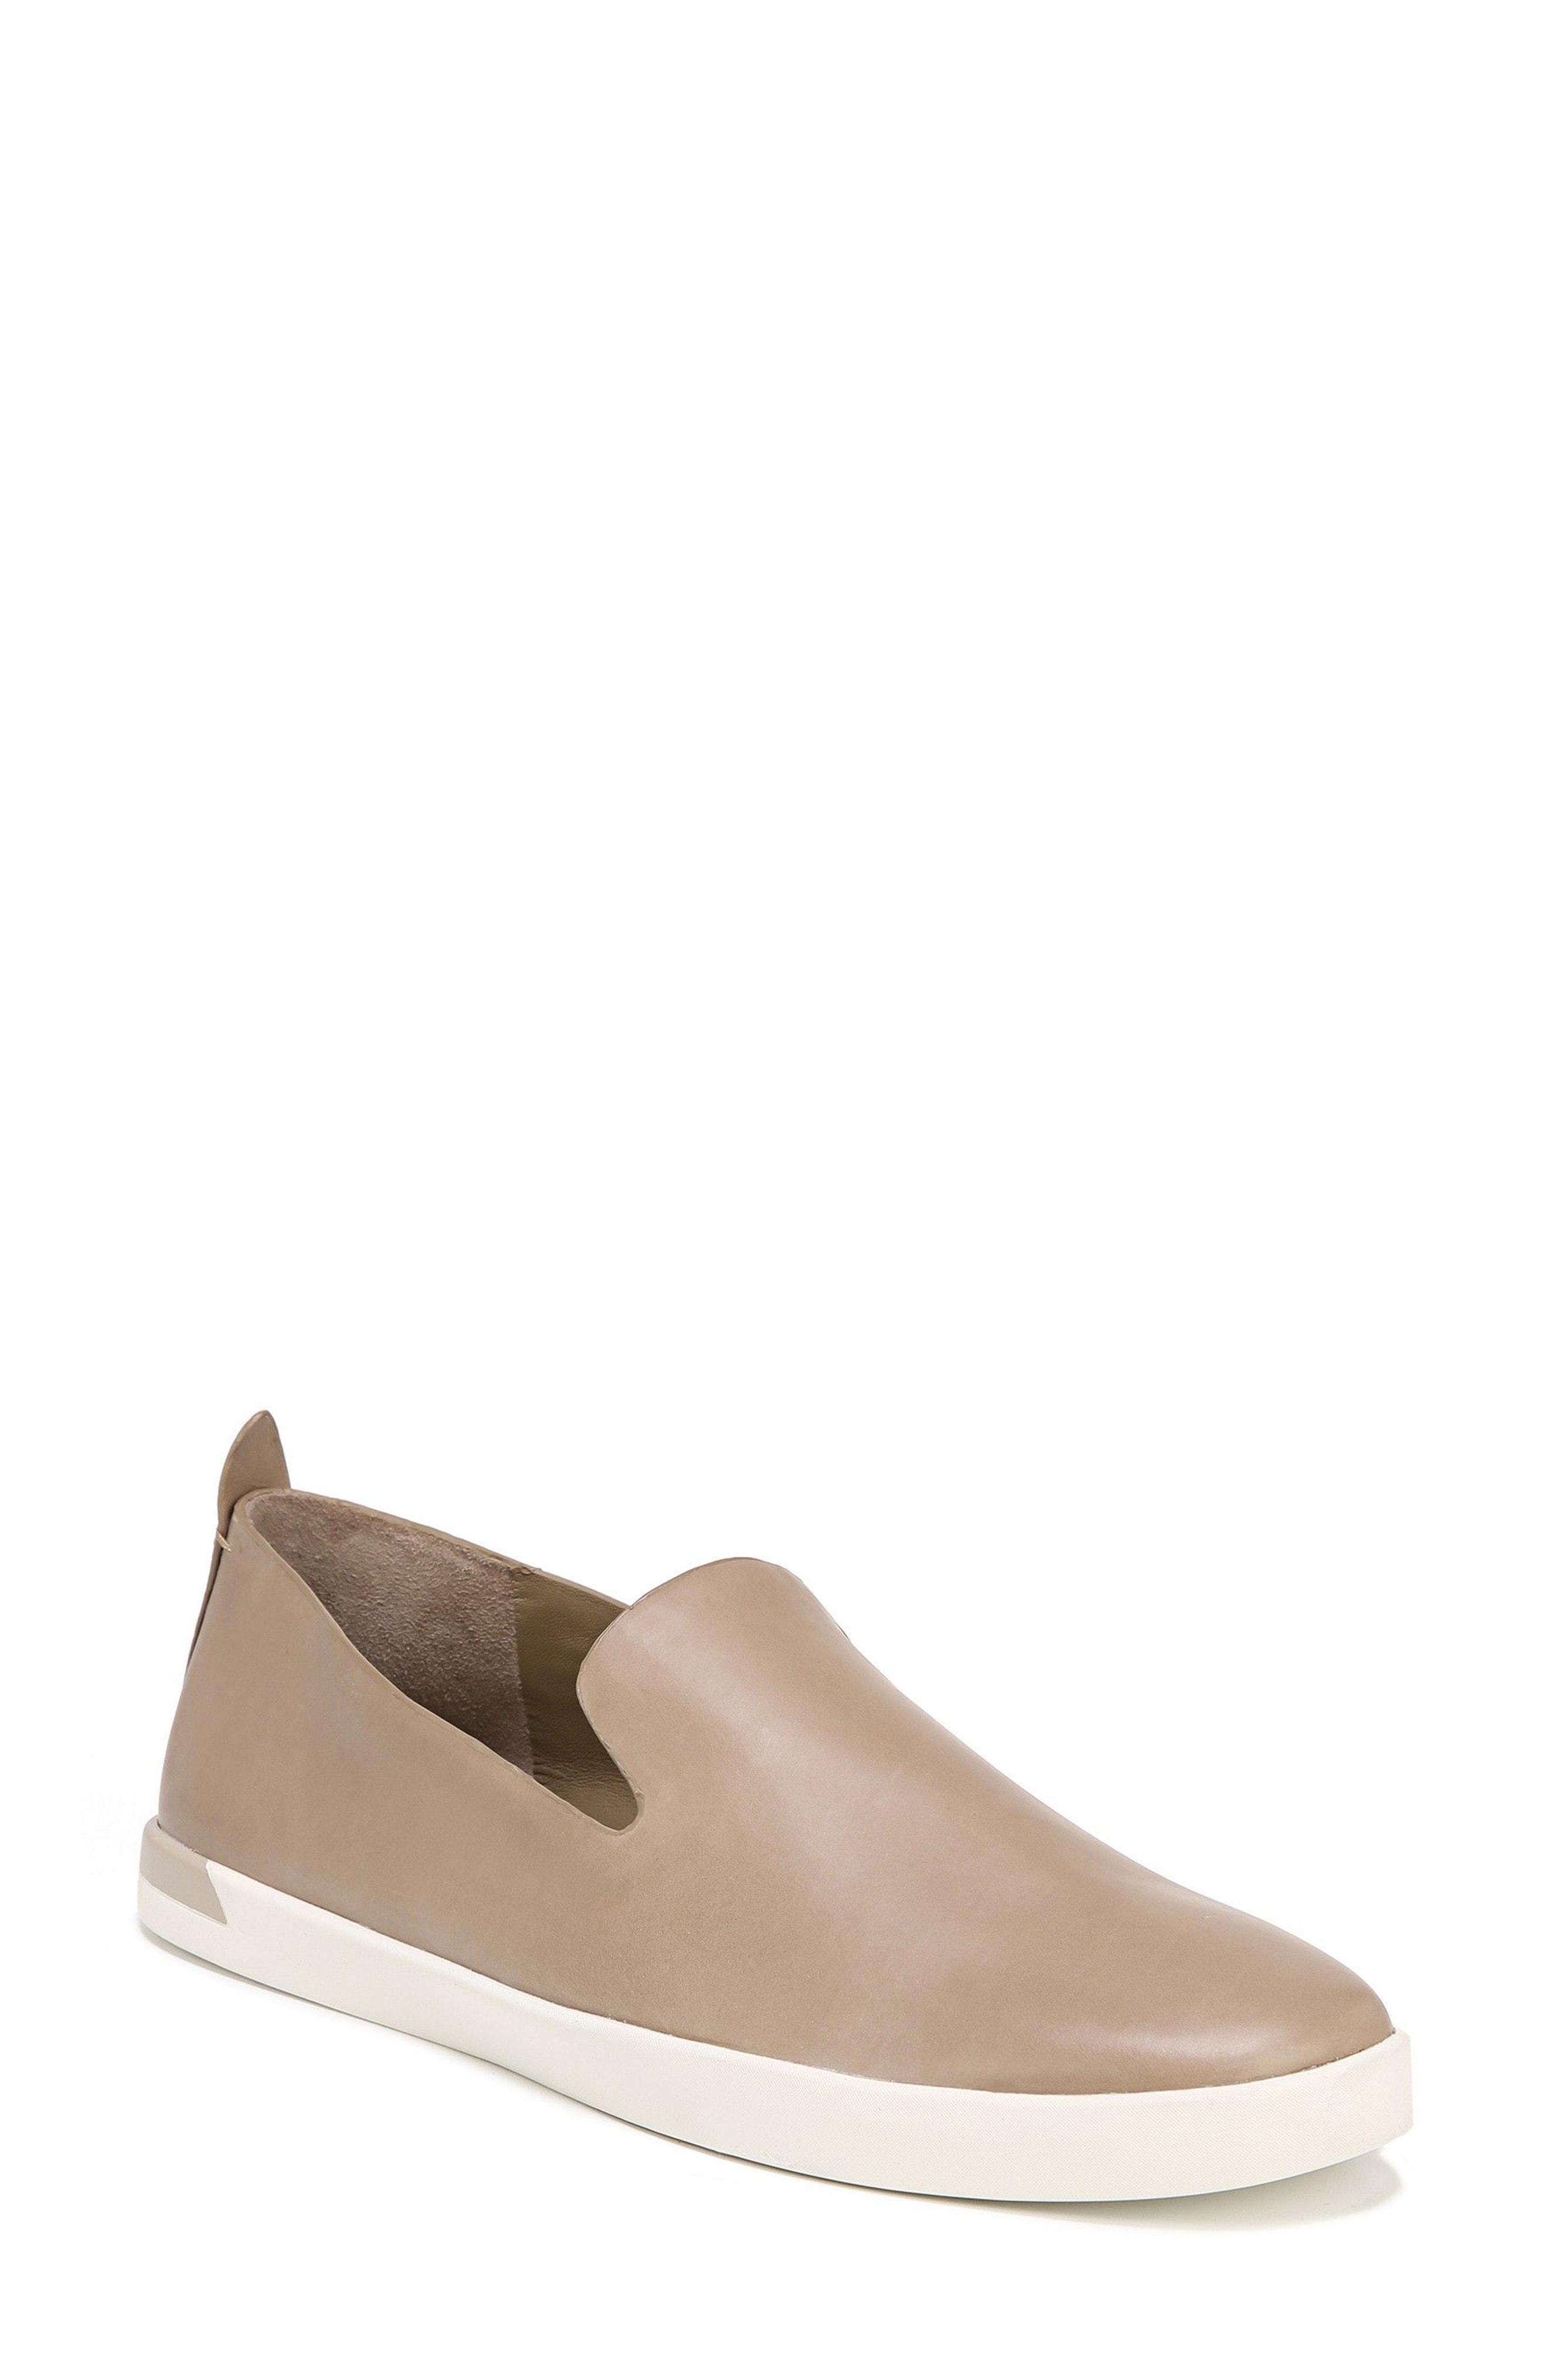 a042ce5f3b92 Lyst - Vince Vero Sneaker in Natural